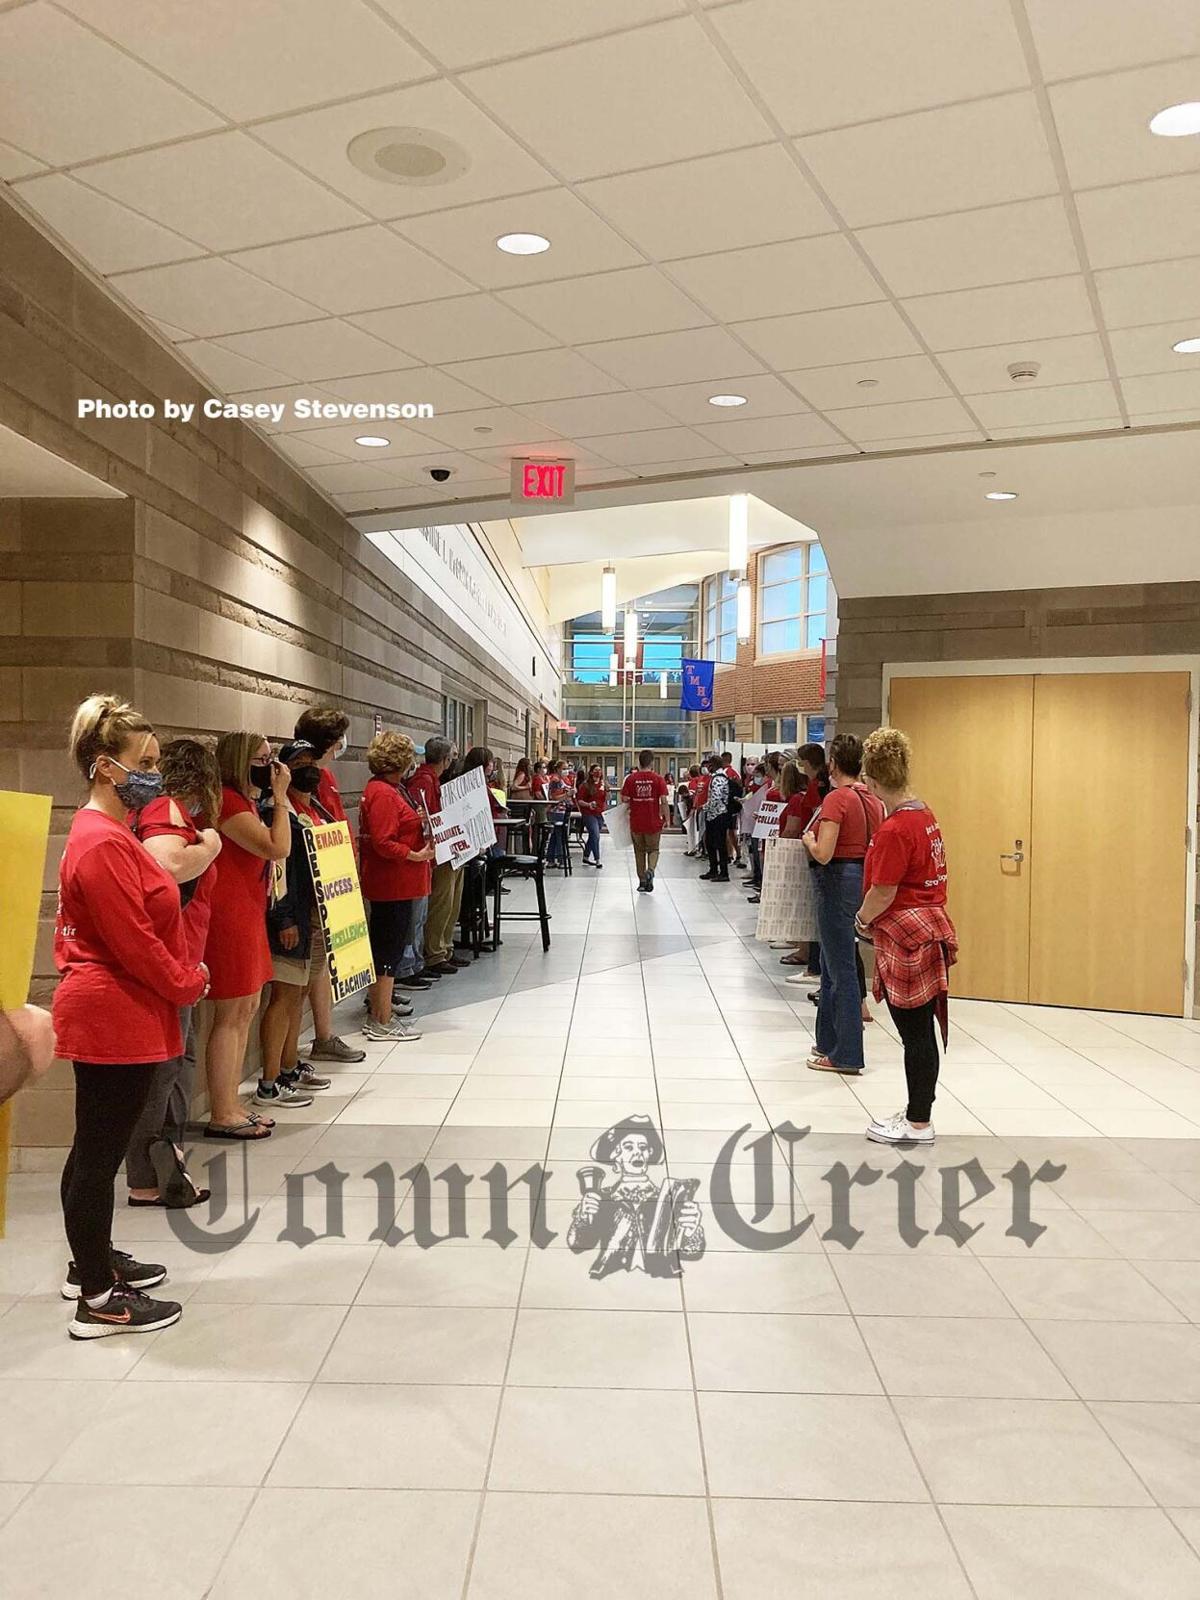 Tewksbury teachers and aides wait outside the auditorium